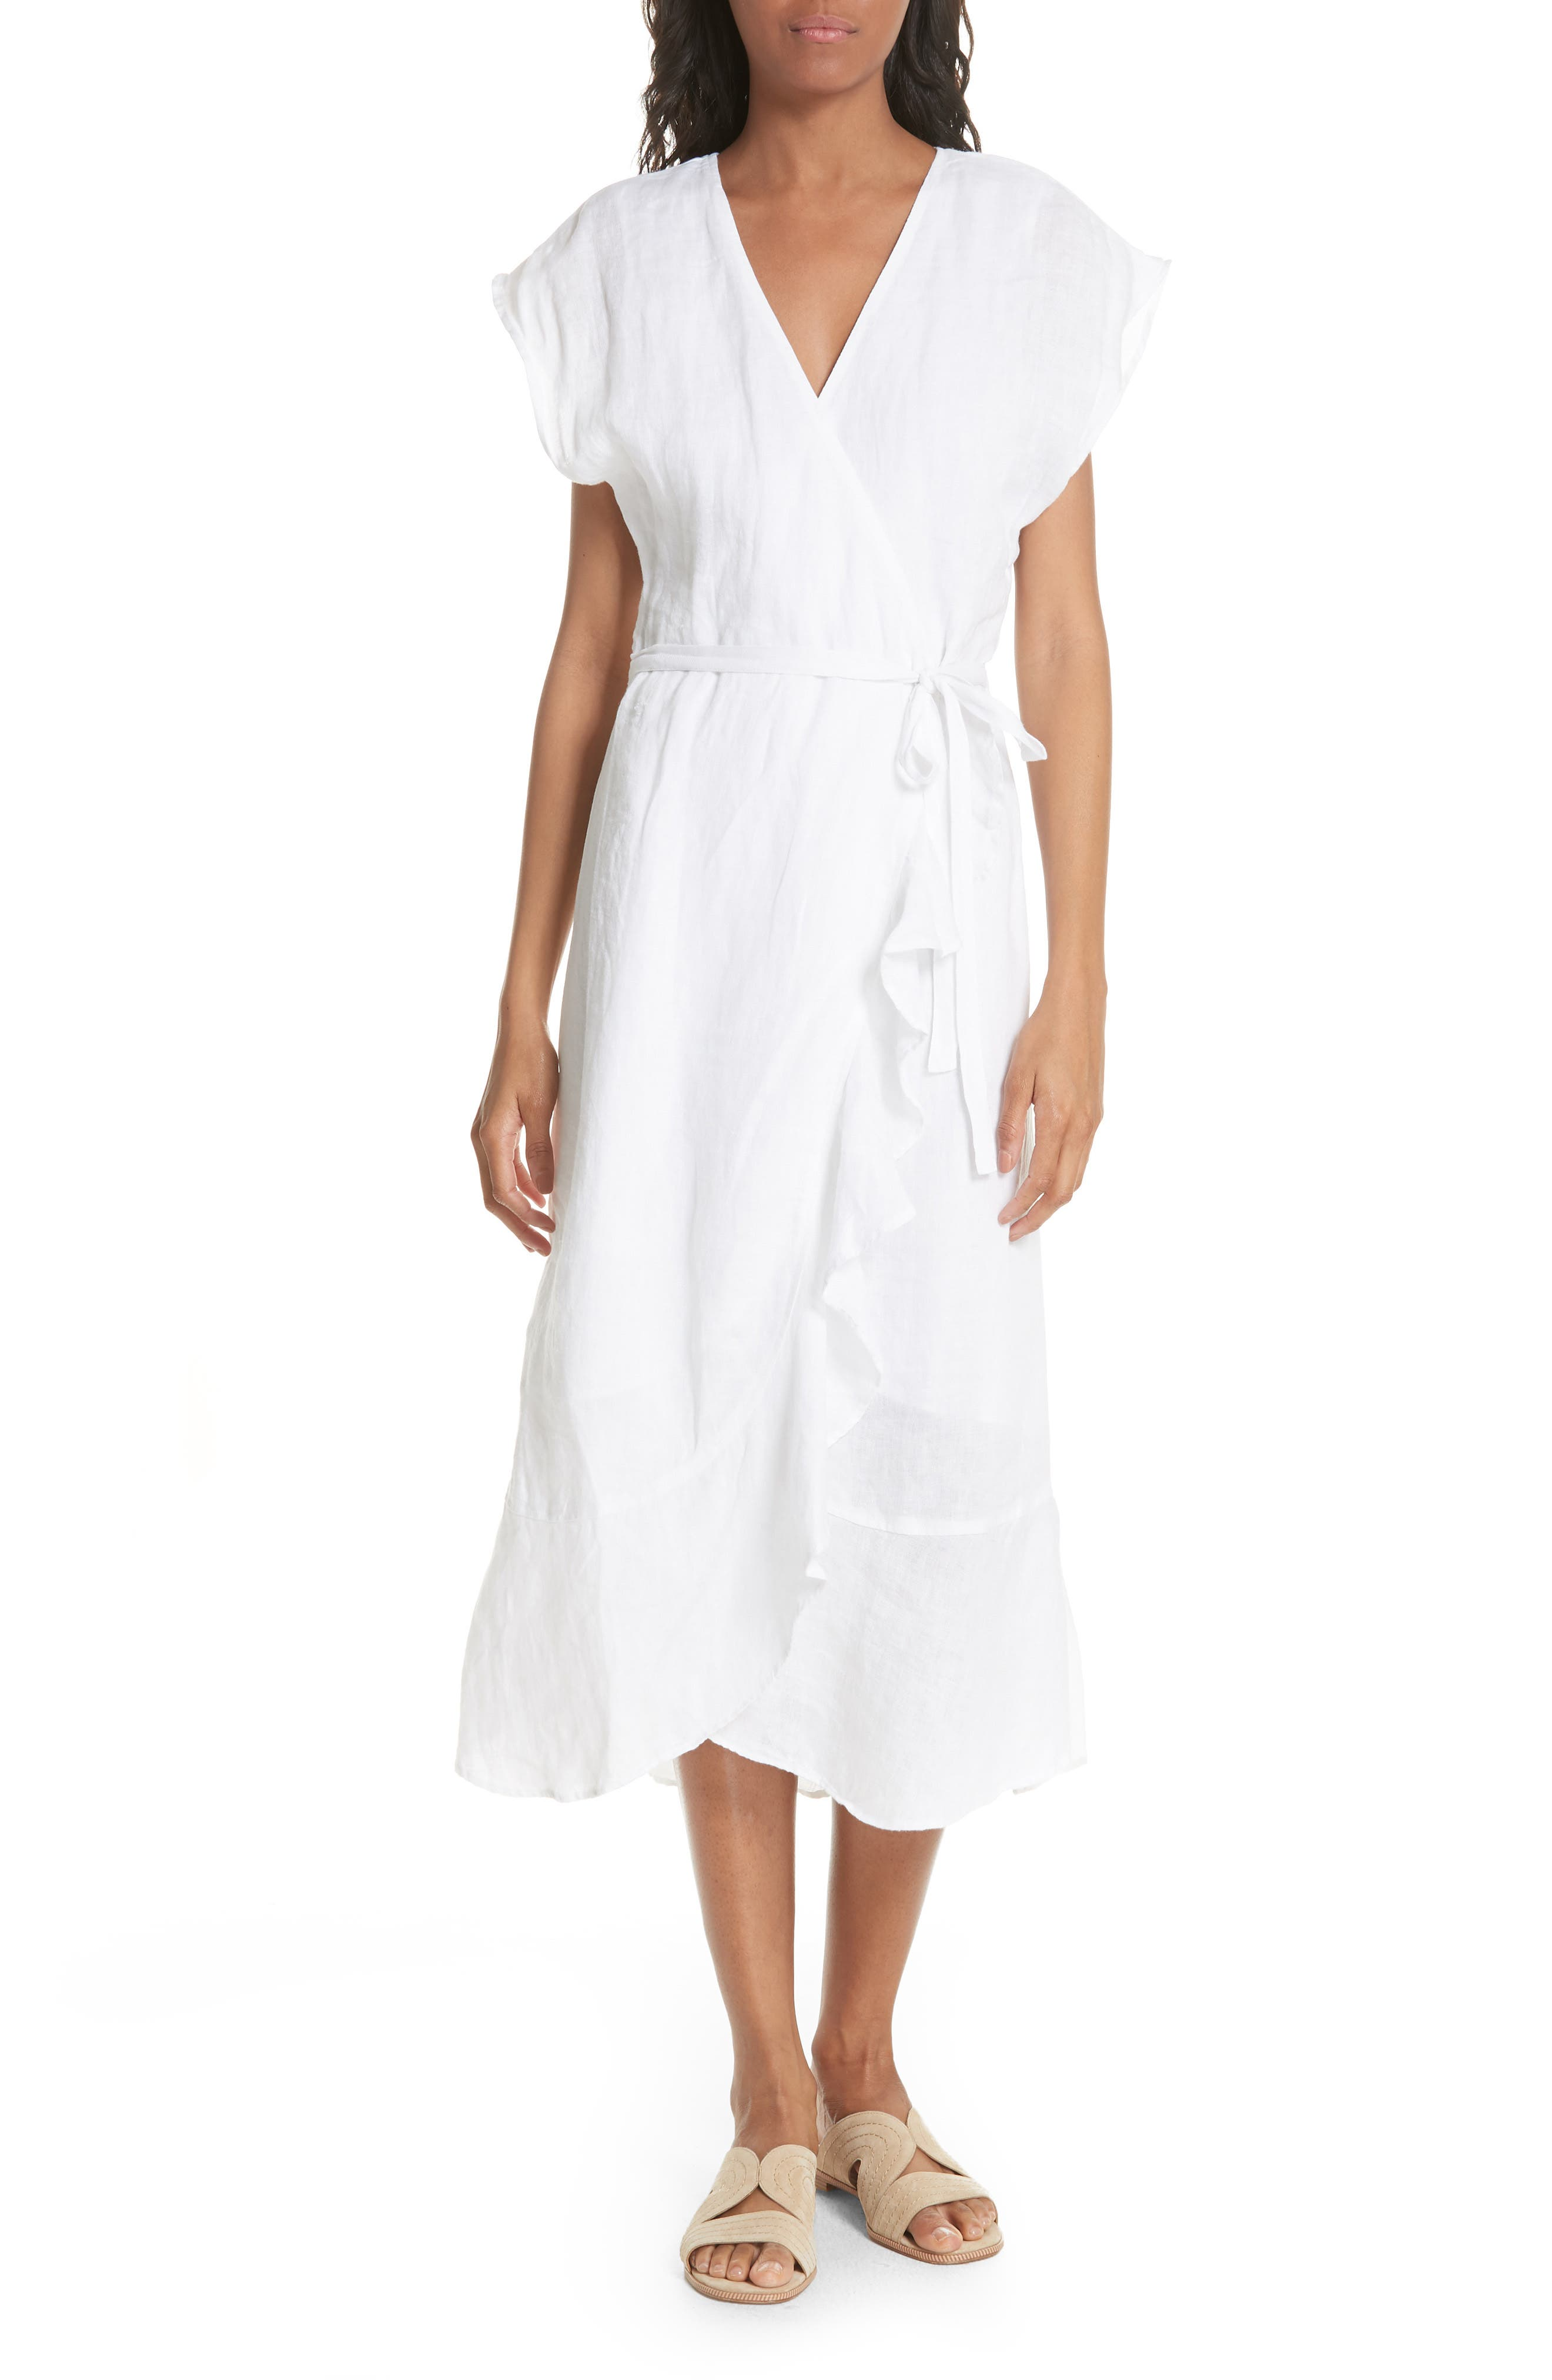 Filma Back Cutout Linen Wrap Dress by Joie